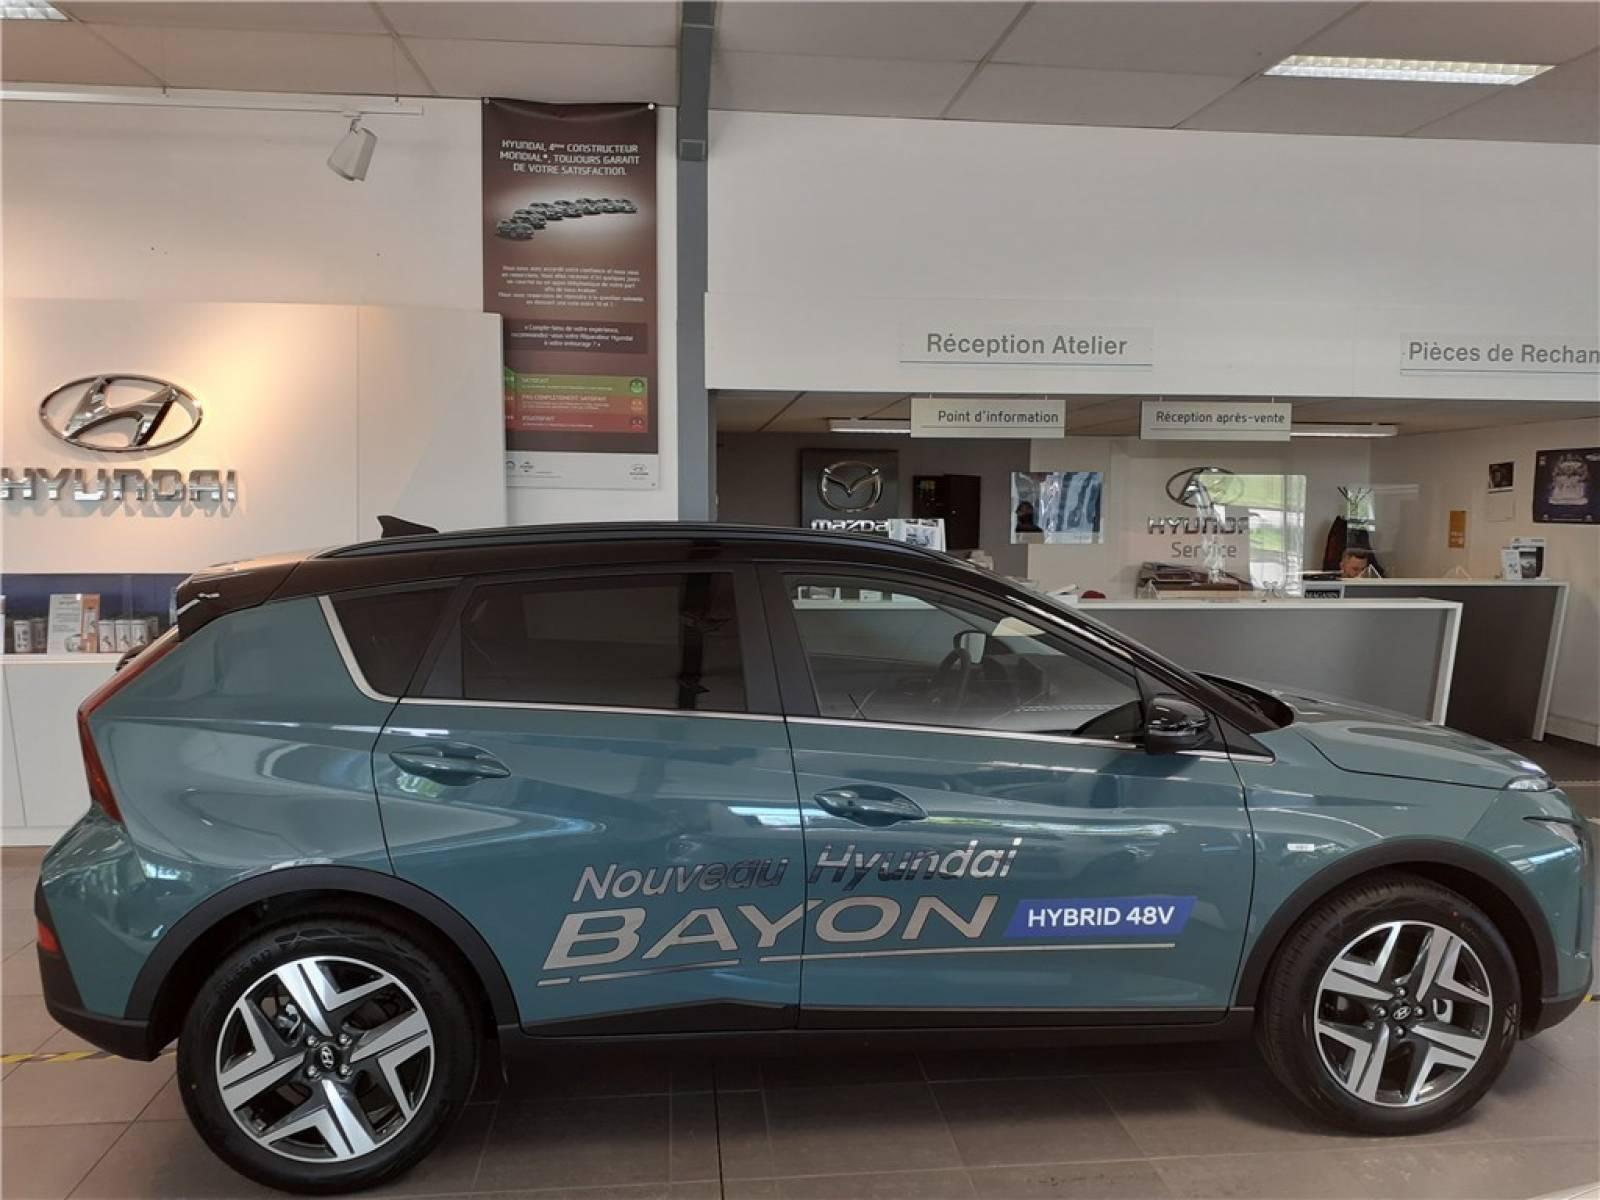 HYUNDAI Bayon 1.0 T-GDi 100 DCT-7 Hybrid 48V - véhicule d'occasion - Groupe Guillet - Chalon Automobiles - 71100 - Chalon-sur-Saône - 49